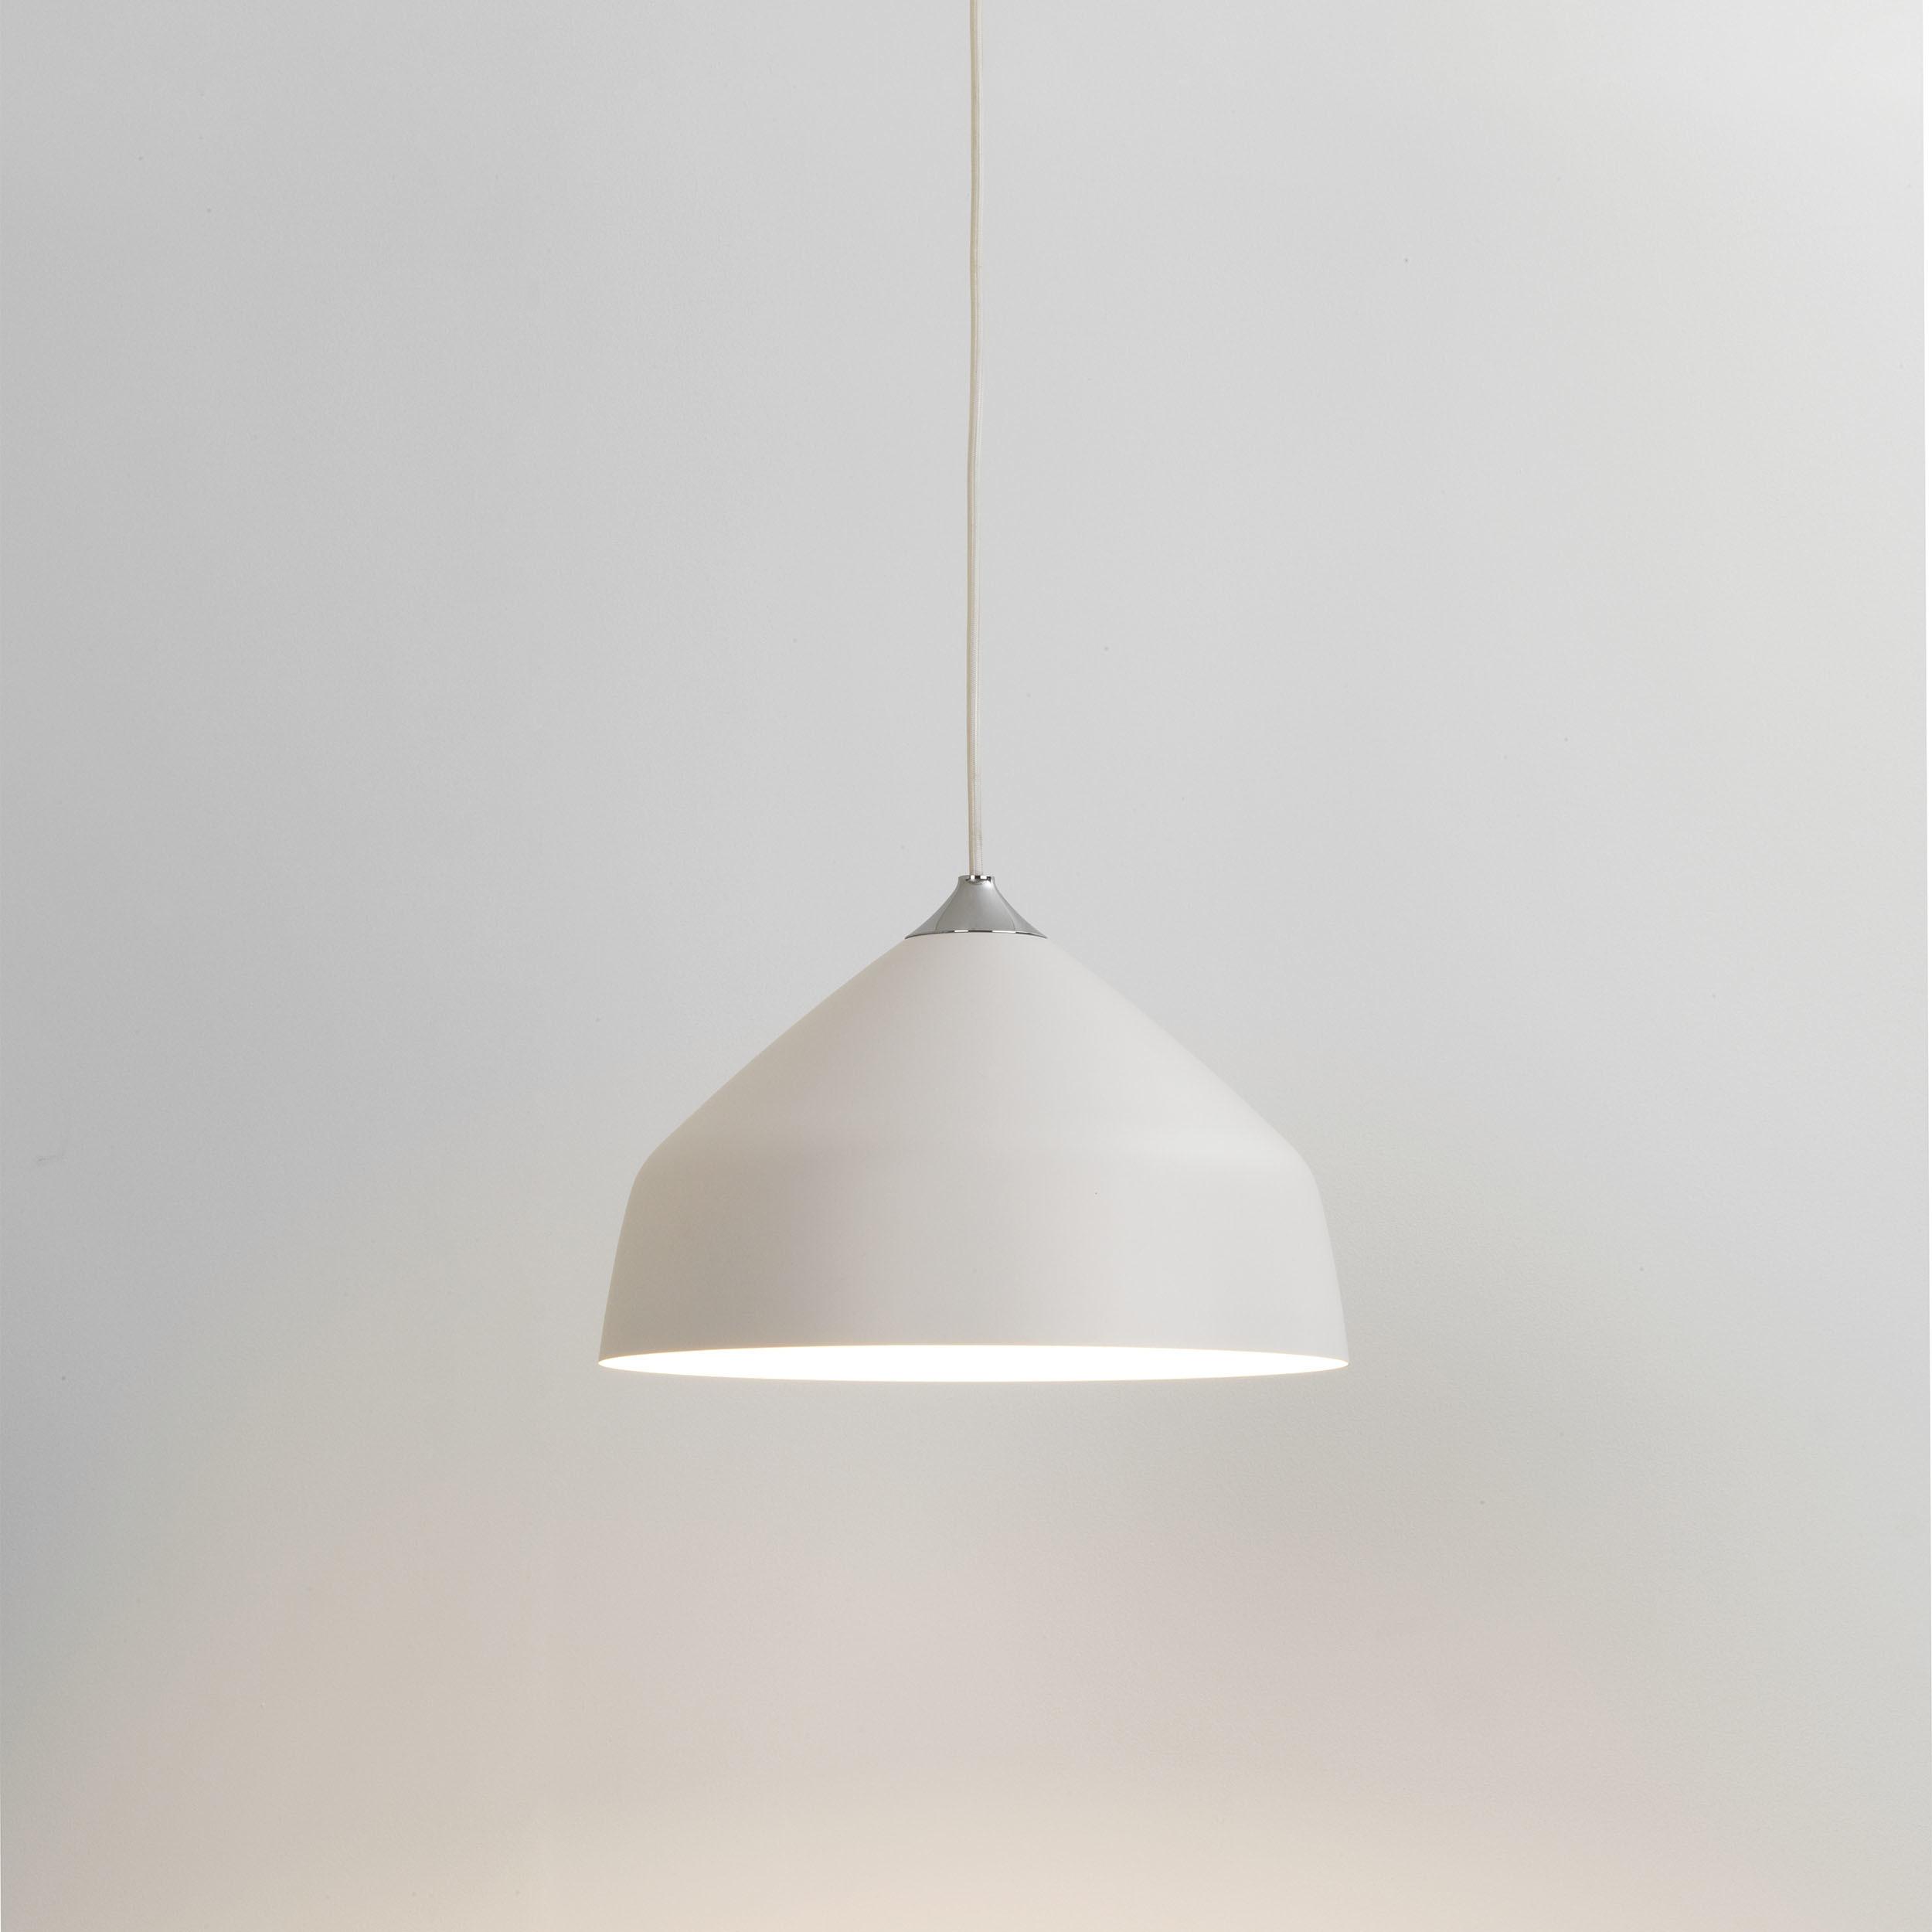 Подвесной светильник Astro Ginestra 1361011 (7810), 1xE27x42W, белый, металл - фото 1